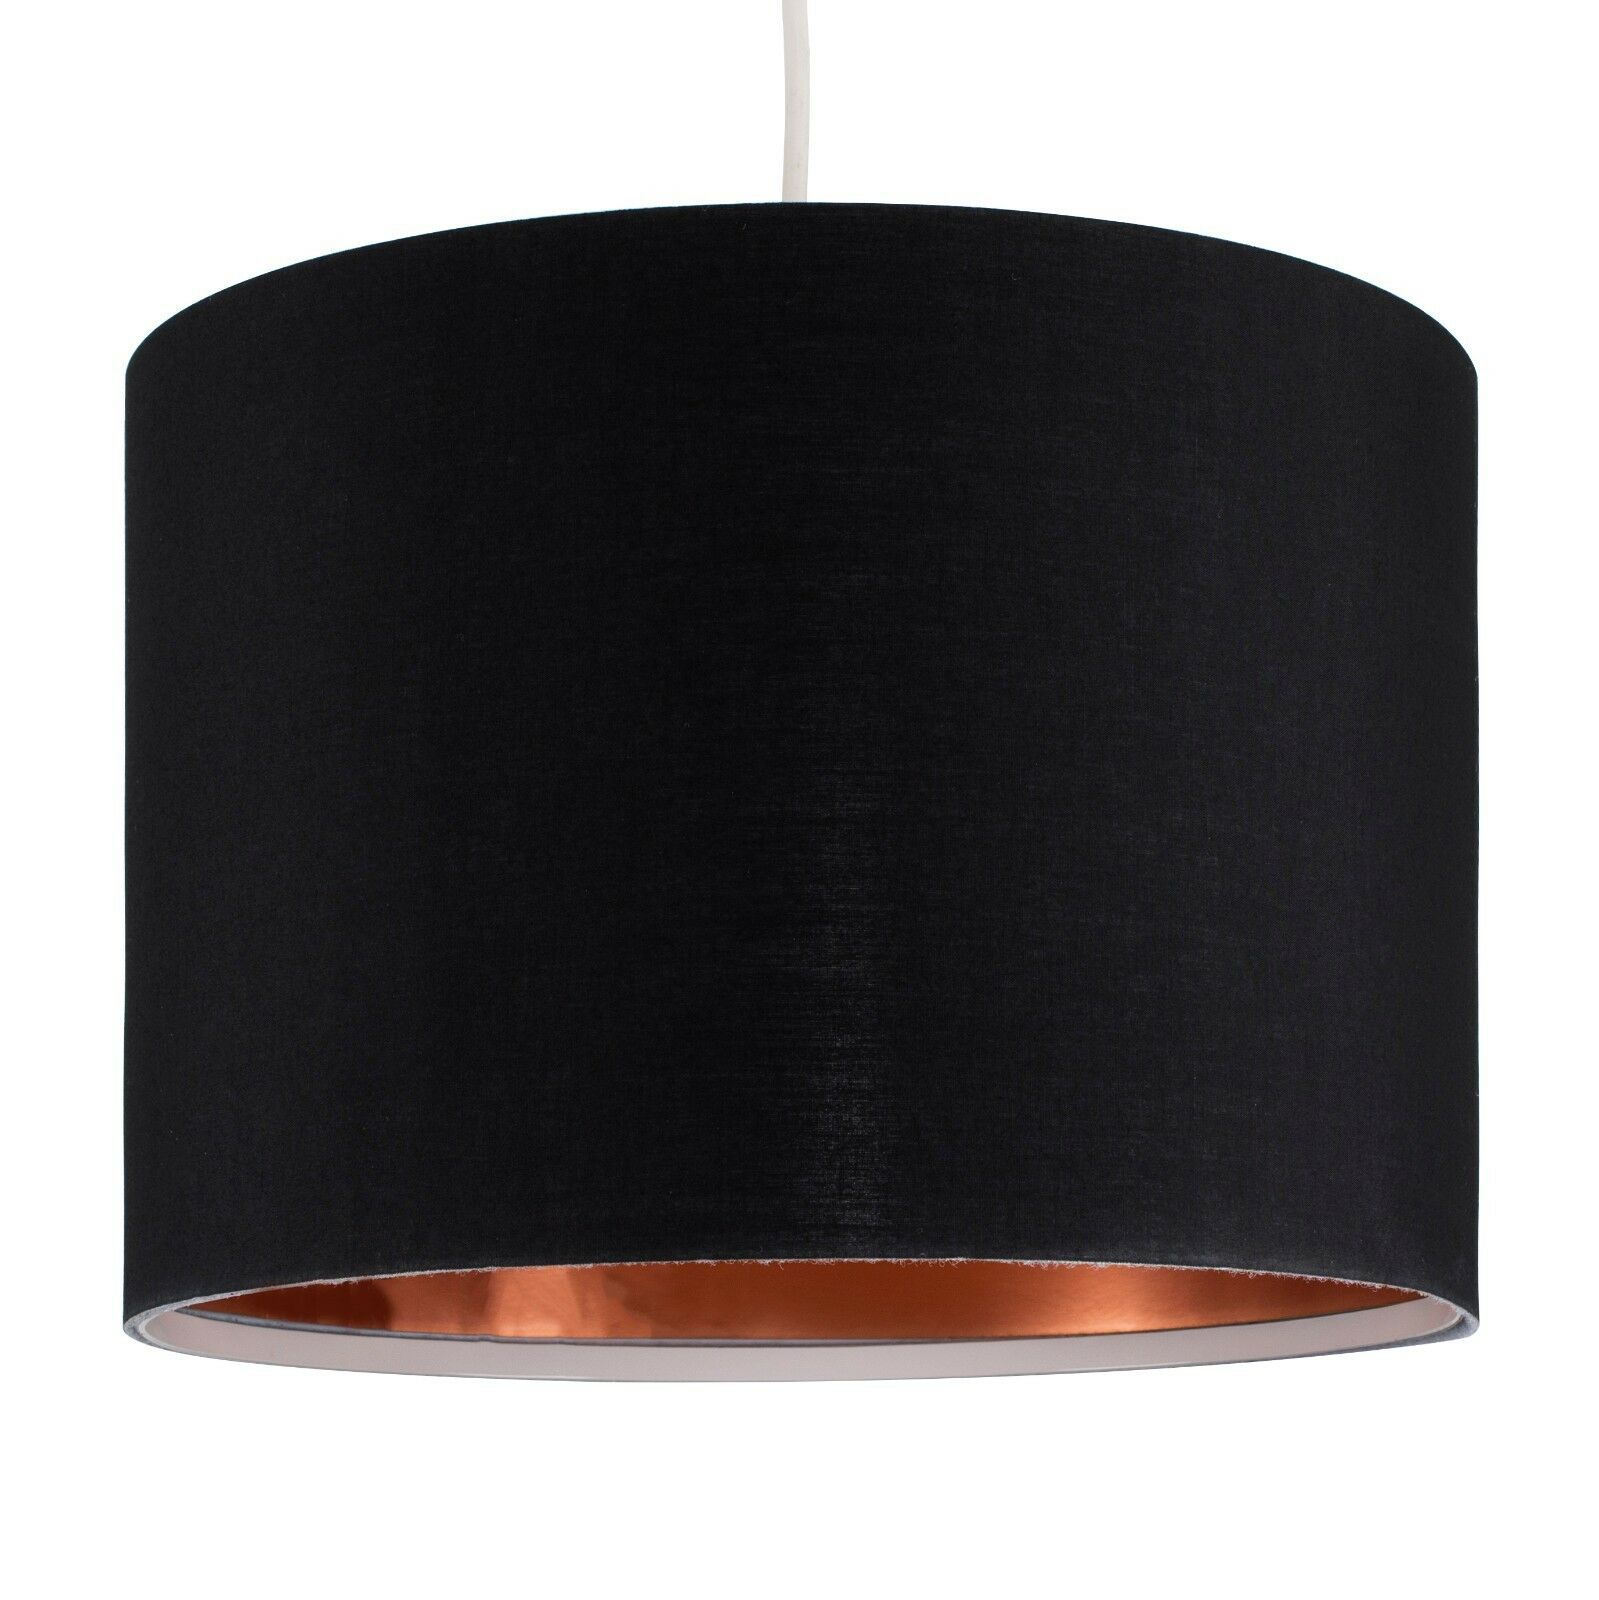 Tela-moderna-algodon-facil-ajuste-Techo-Colgante-Pantalla-De-Mesa-tonos-de-luz-de-tambor miniatura 32